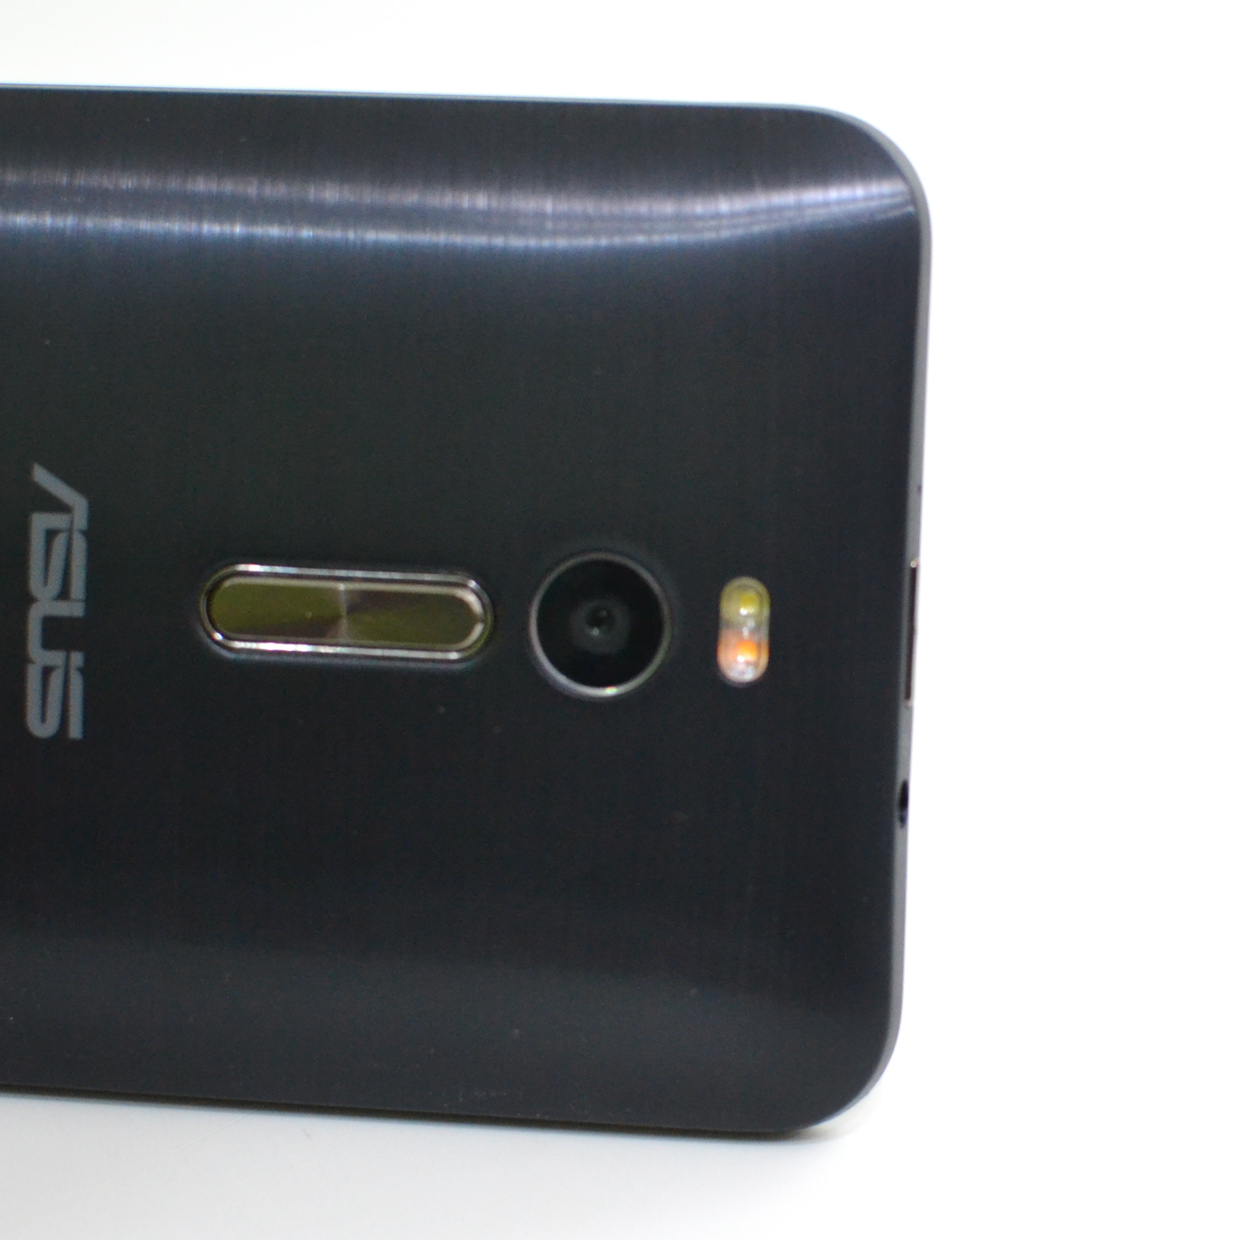 Zenfone 2 review